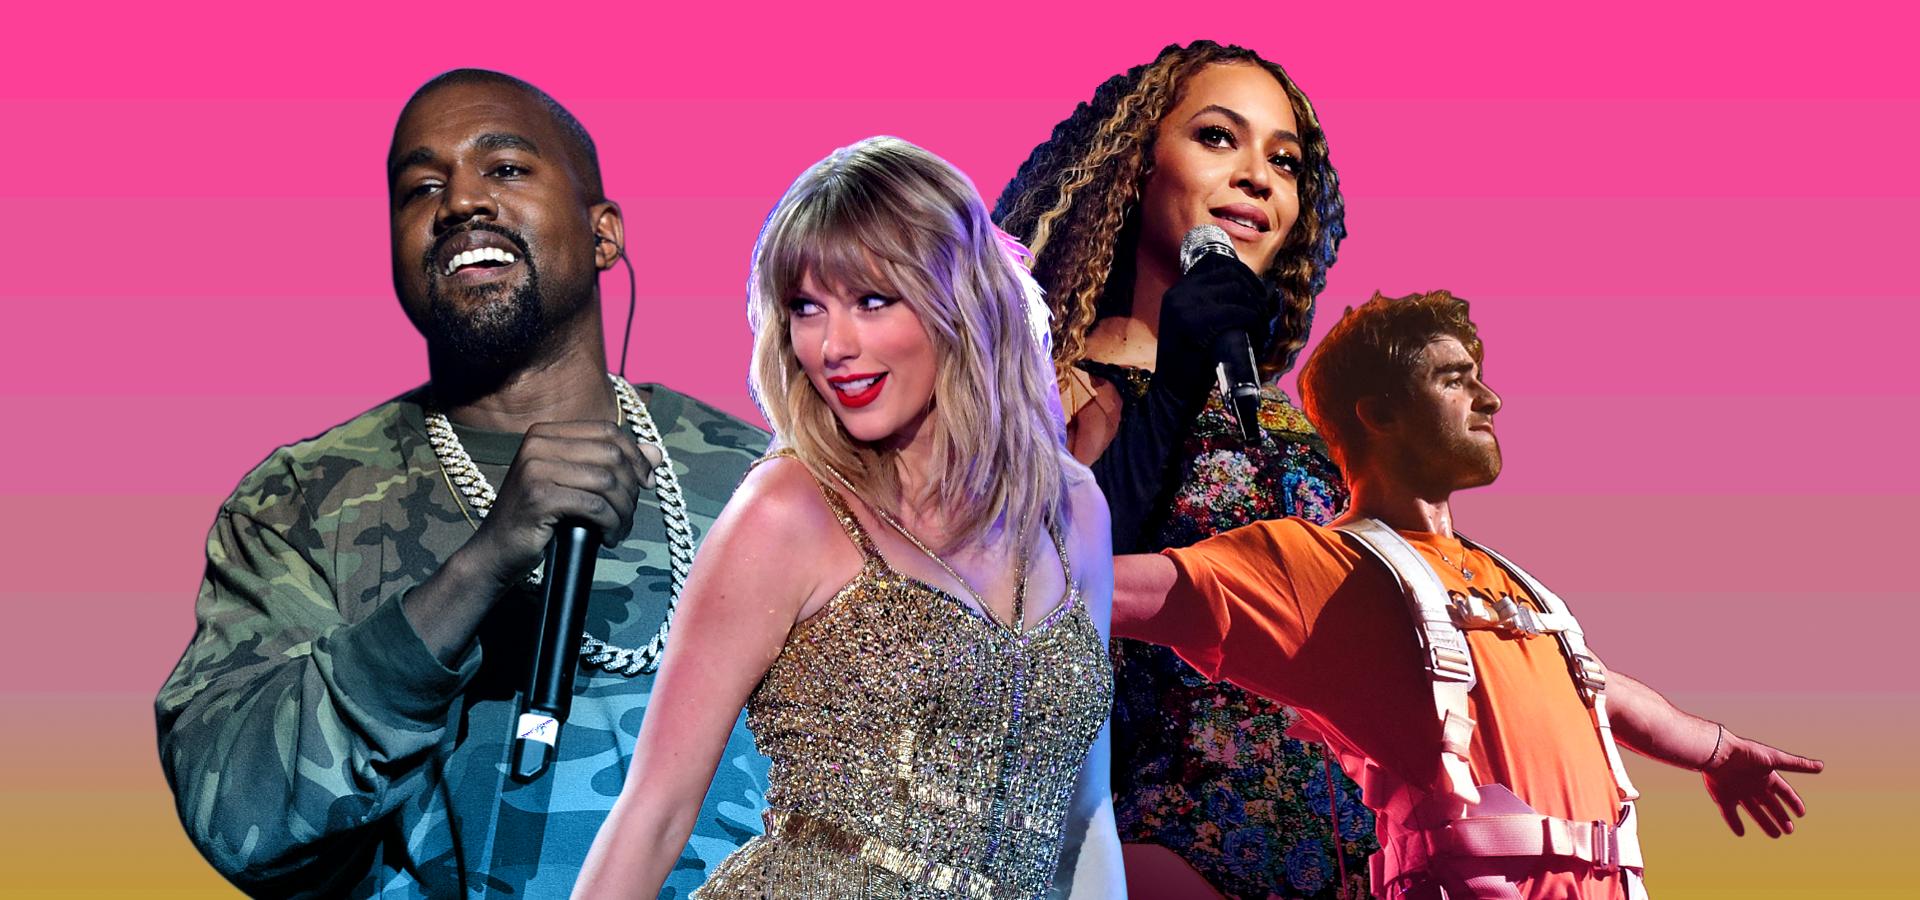 H Taylor Swift στην κορυφή του Forbes με τα υψηλότερα έσοδα για το 2019